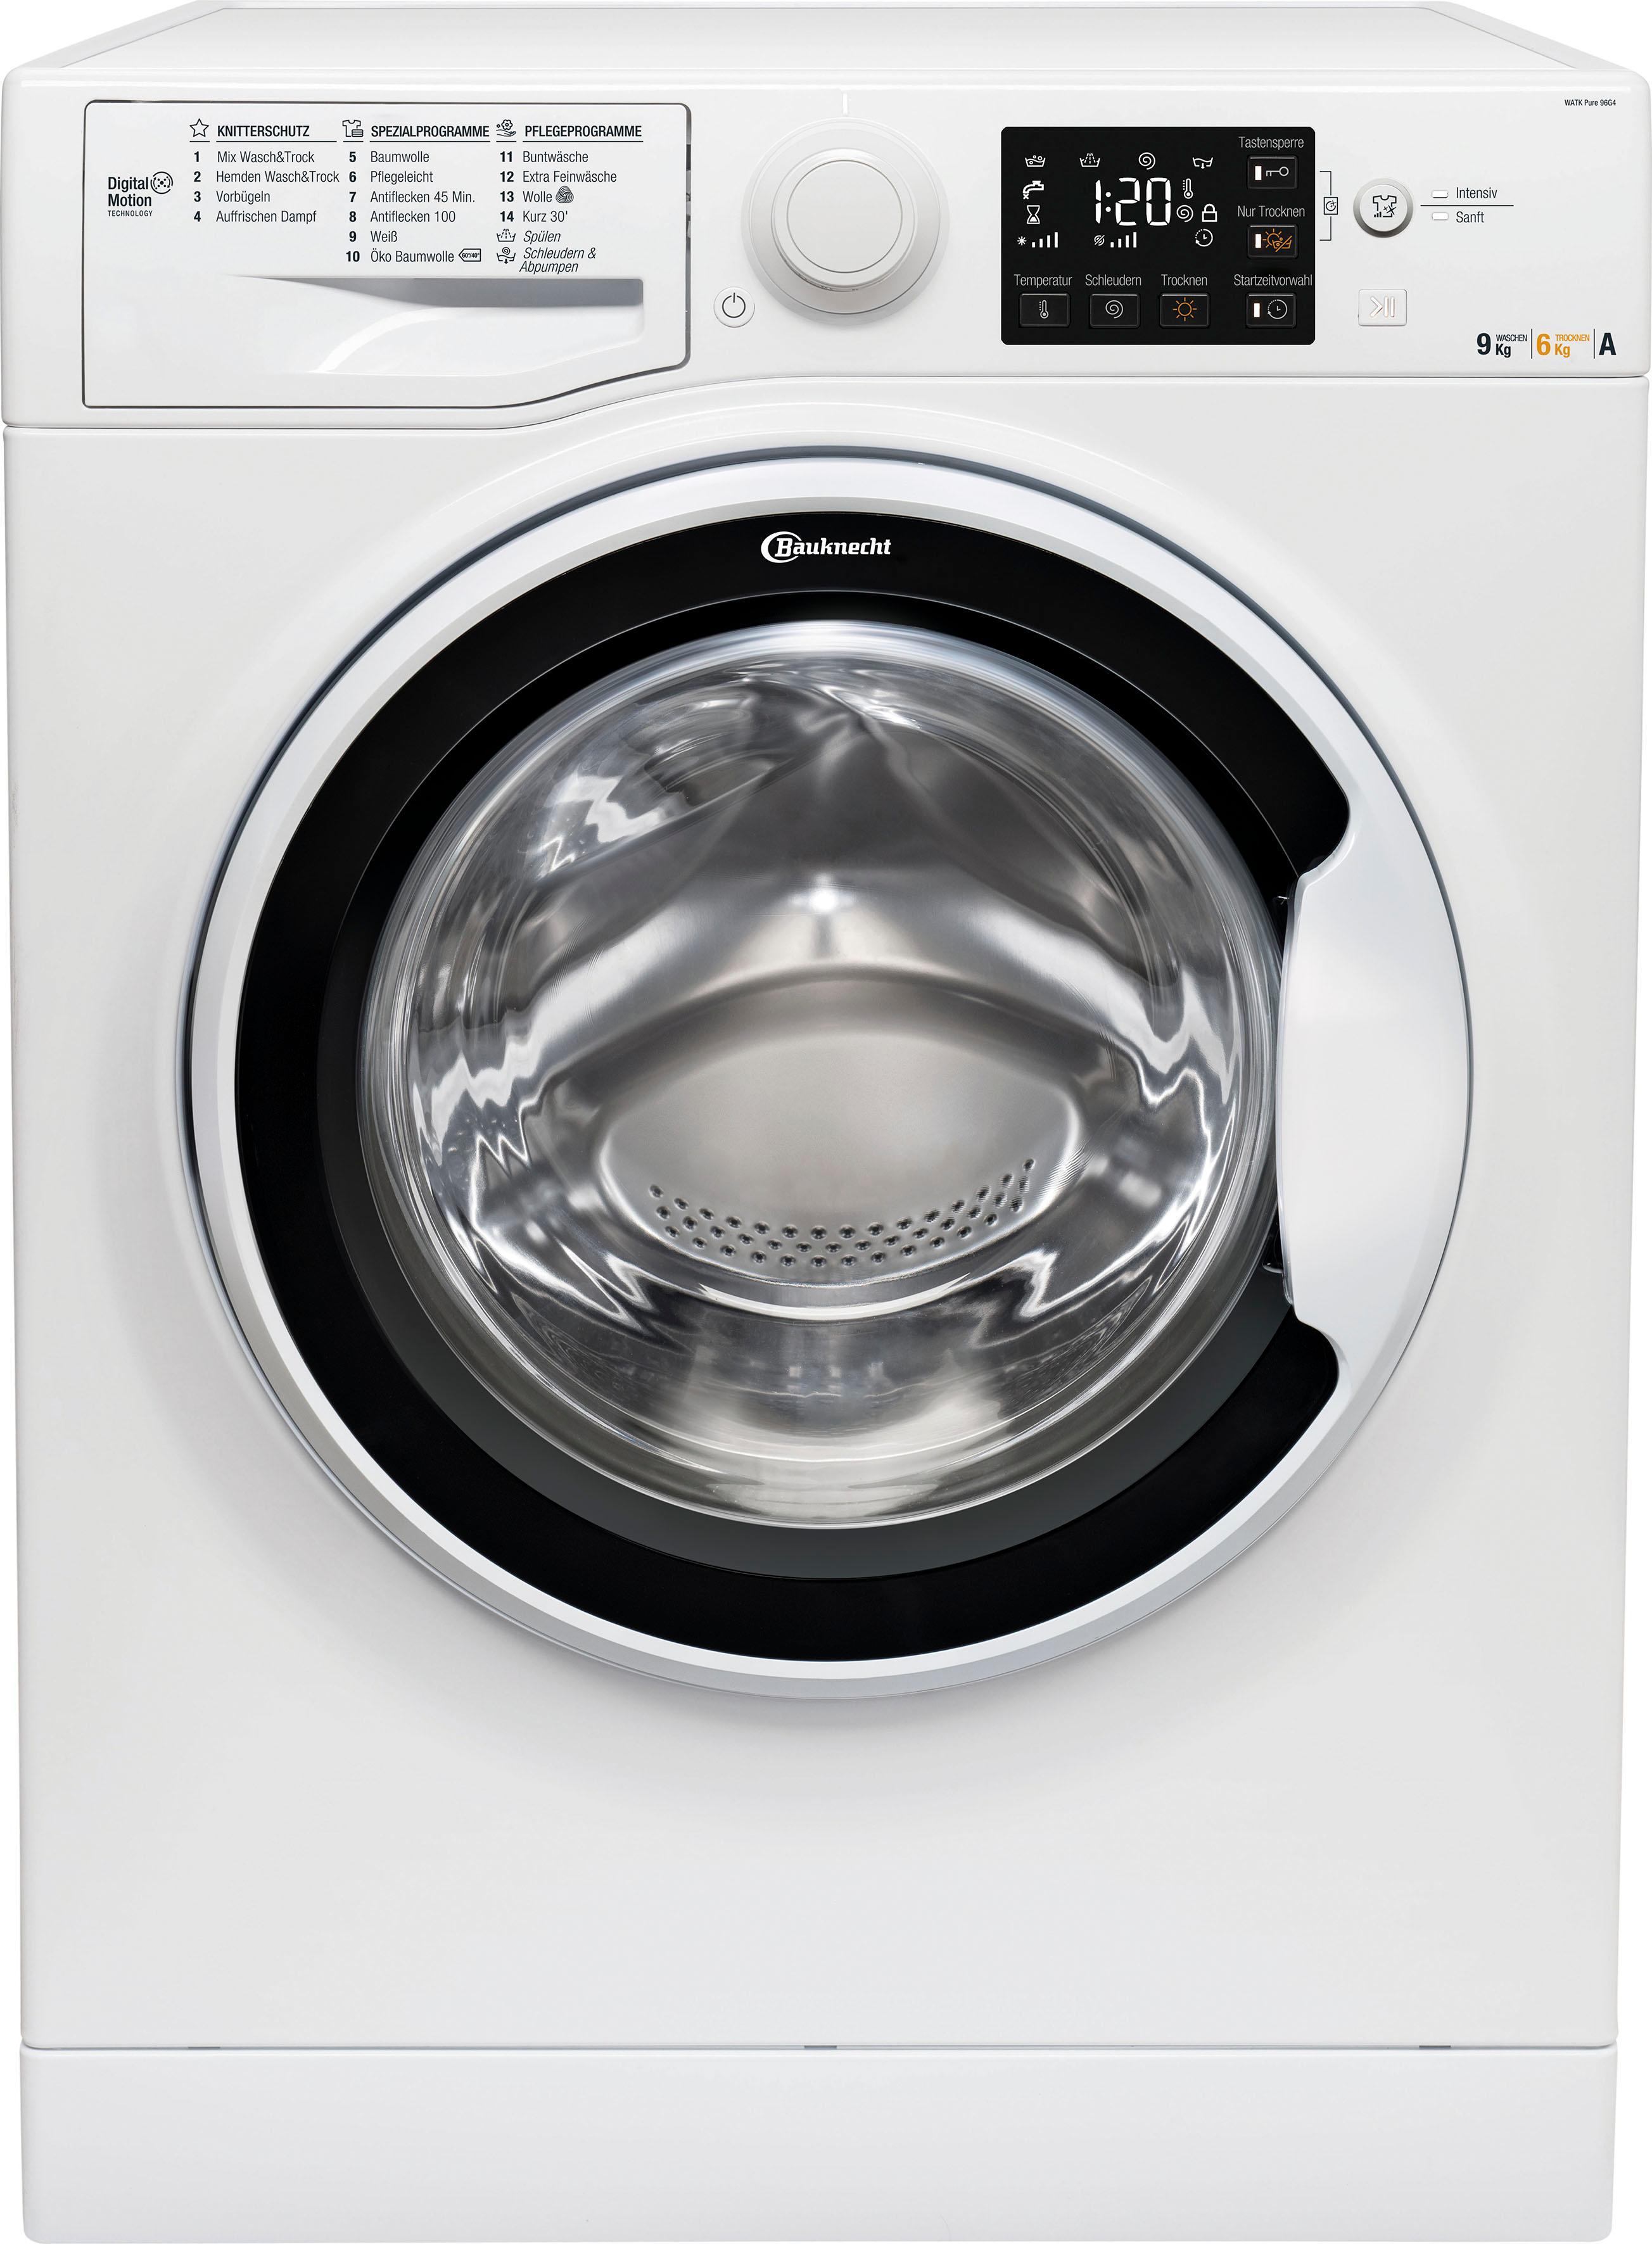 BAUKNECHT Waschtrockner WATK Pure 96G4, 9 kg / 6 kg, 1400 U/Min